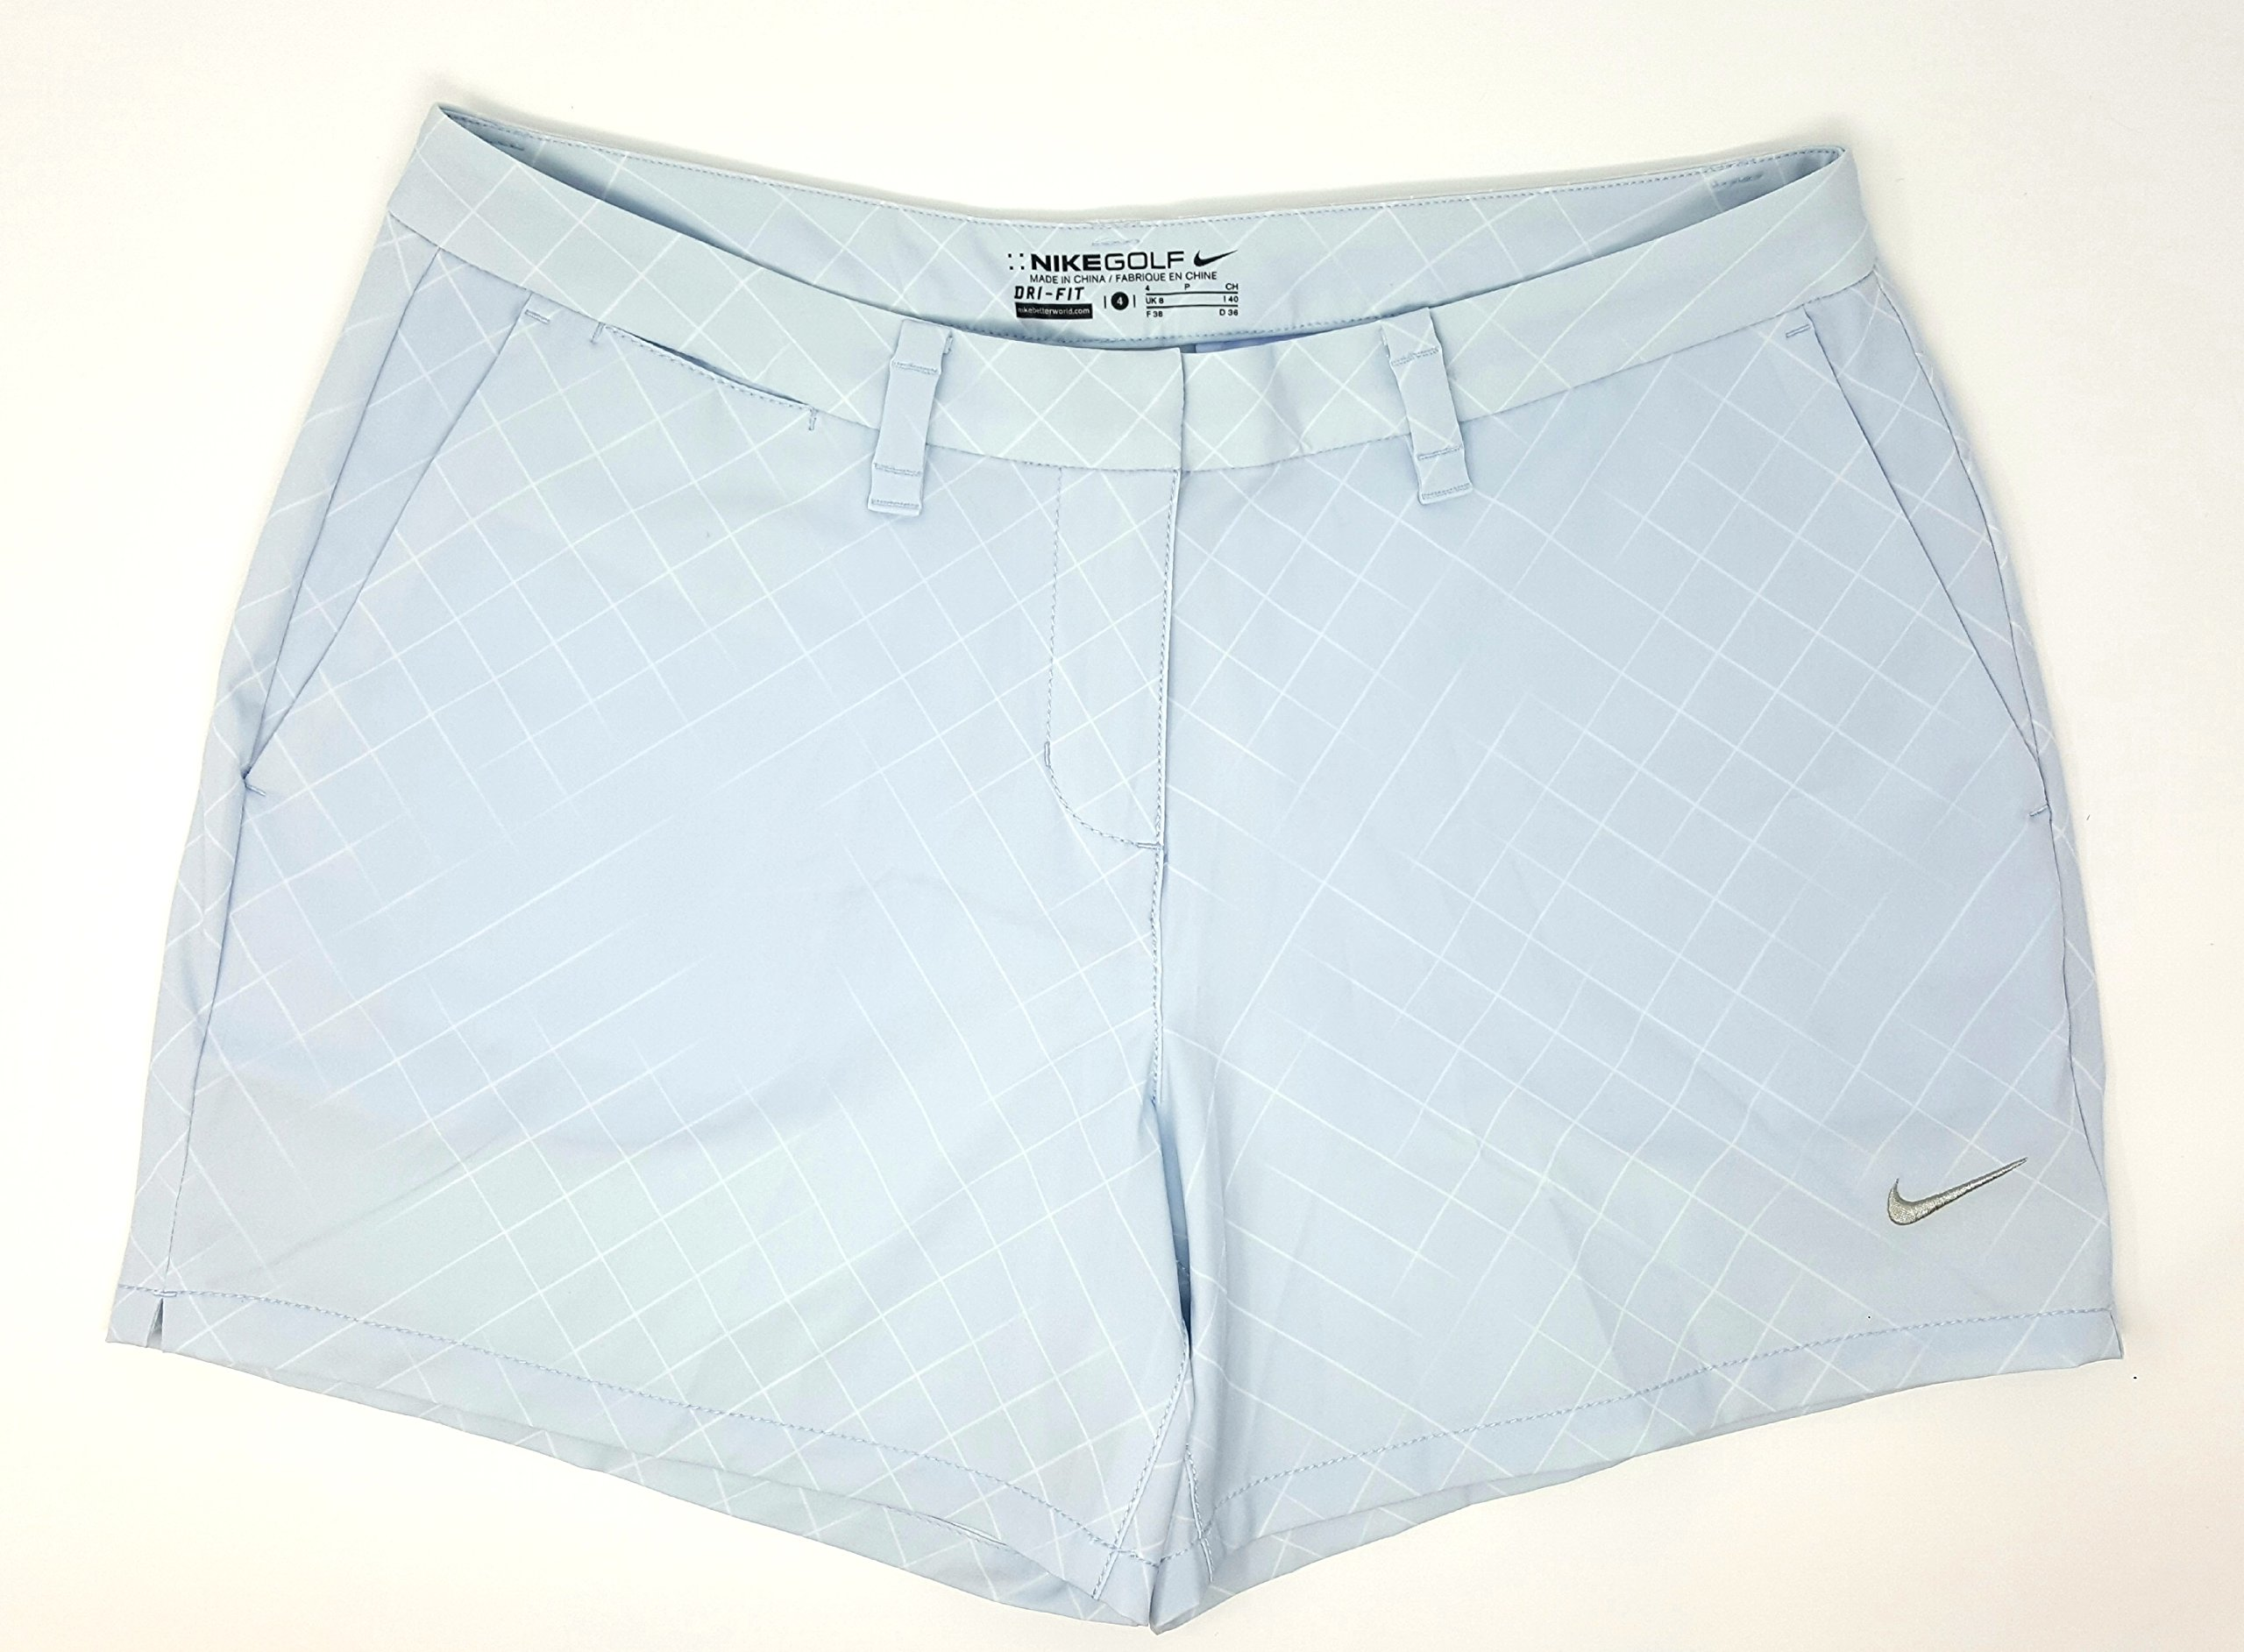 NIKE Women's Dri-fit Flex Print 4.5'' Golf Shorts (Size: 4) Light Ice Blue Grey/White